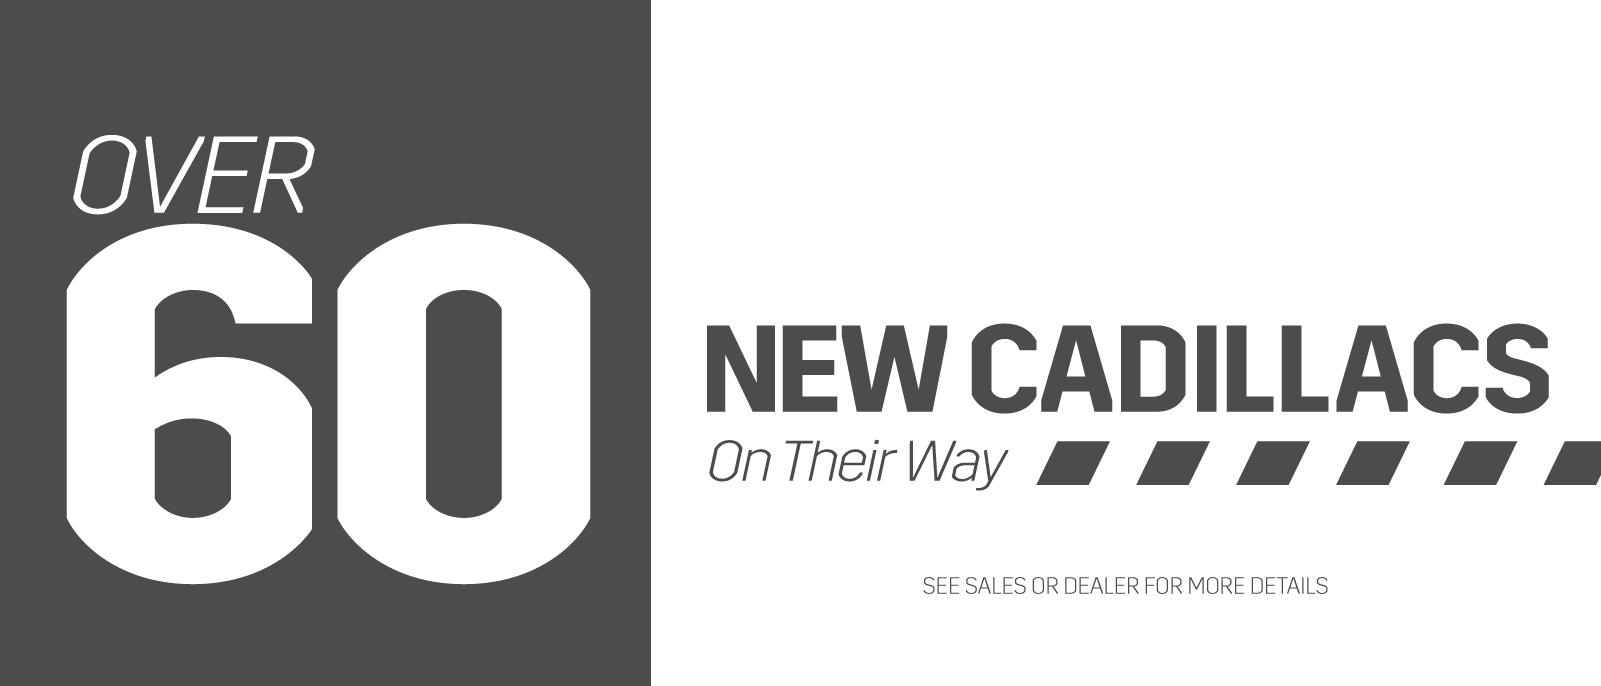 Over-60-New-Cadillacs